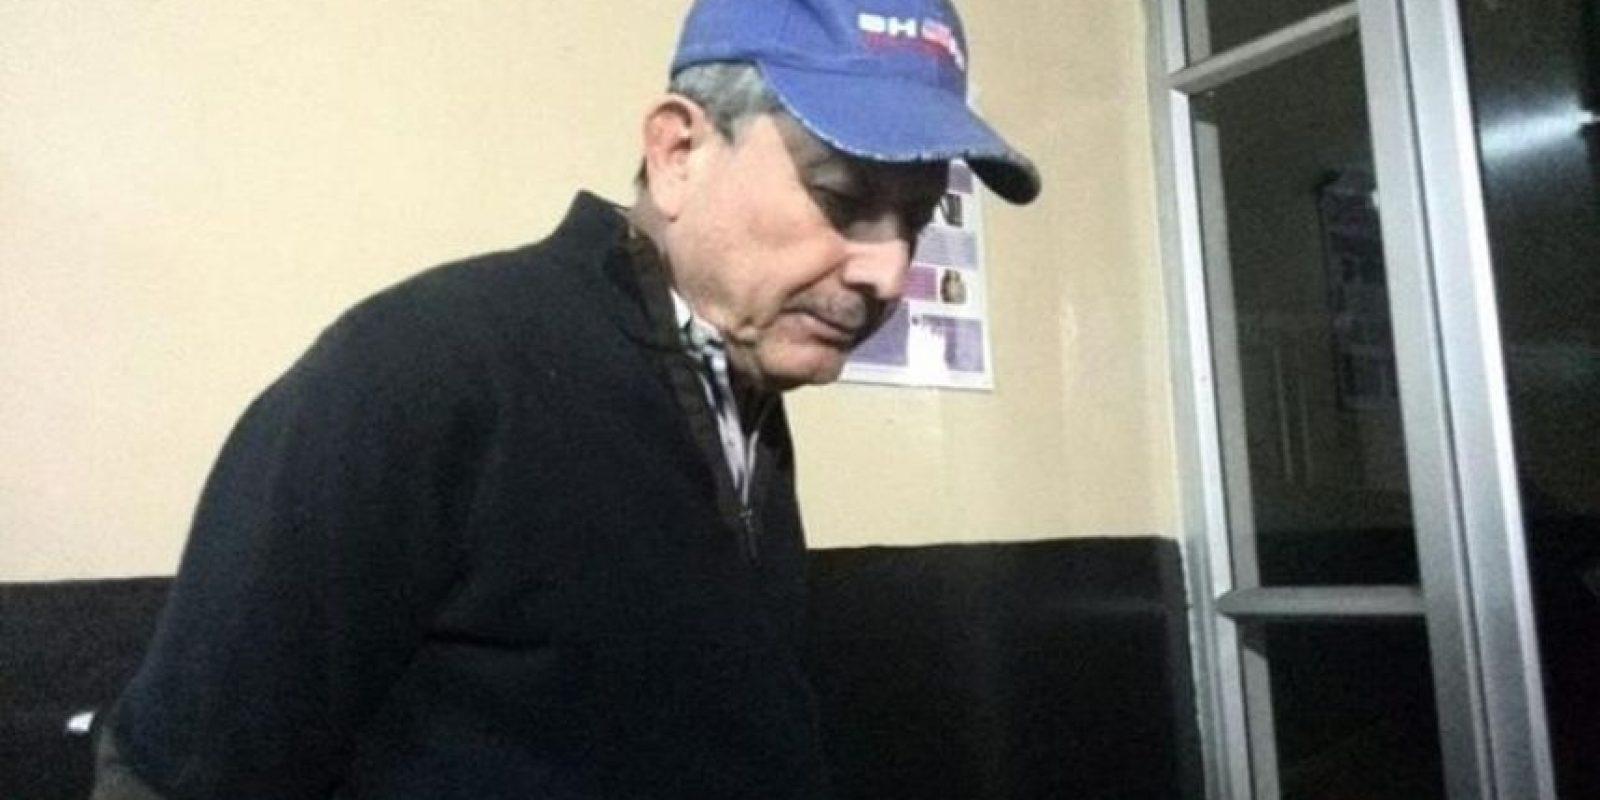 César Medina Farfán negoció con el juez. Foto:Publinews